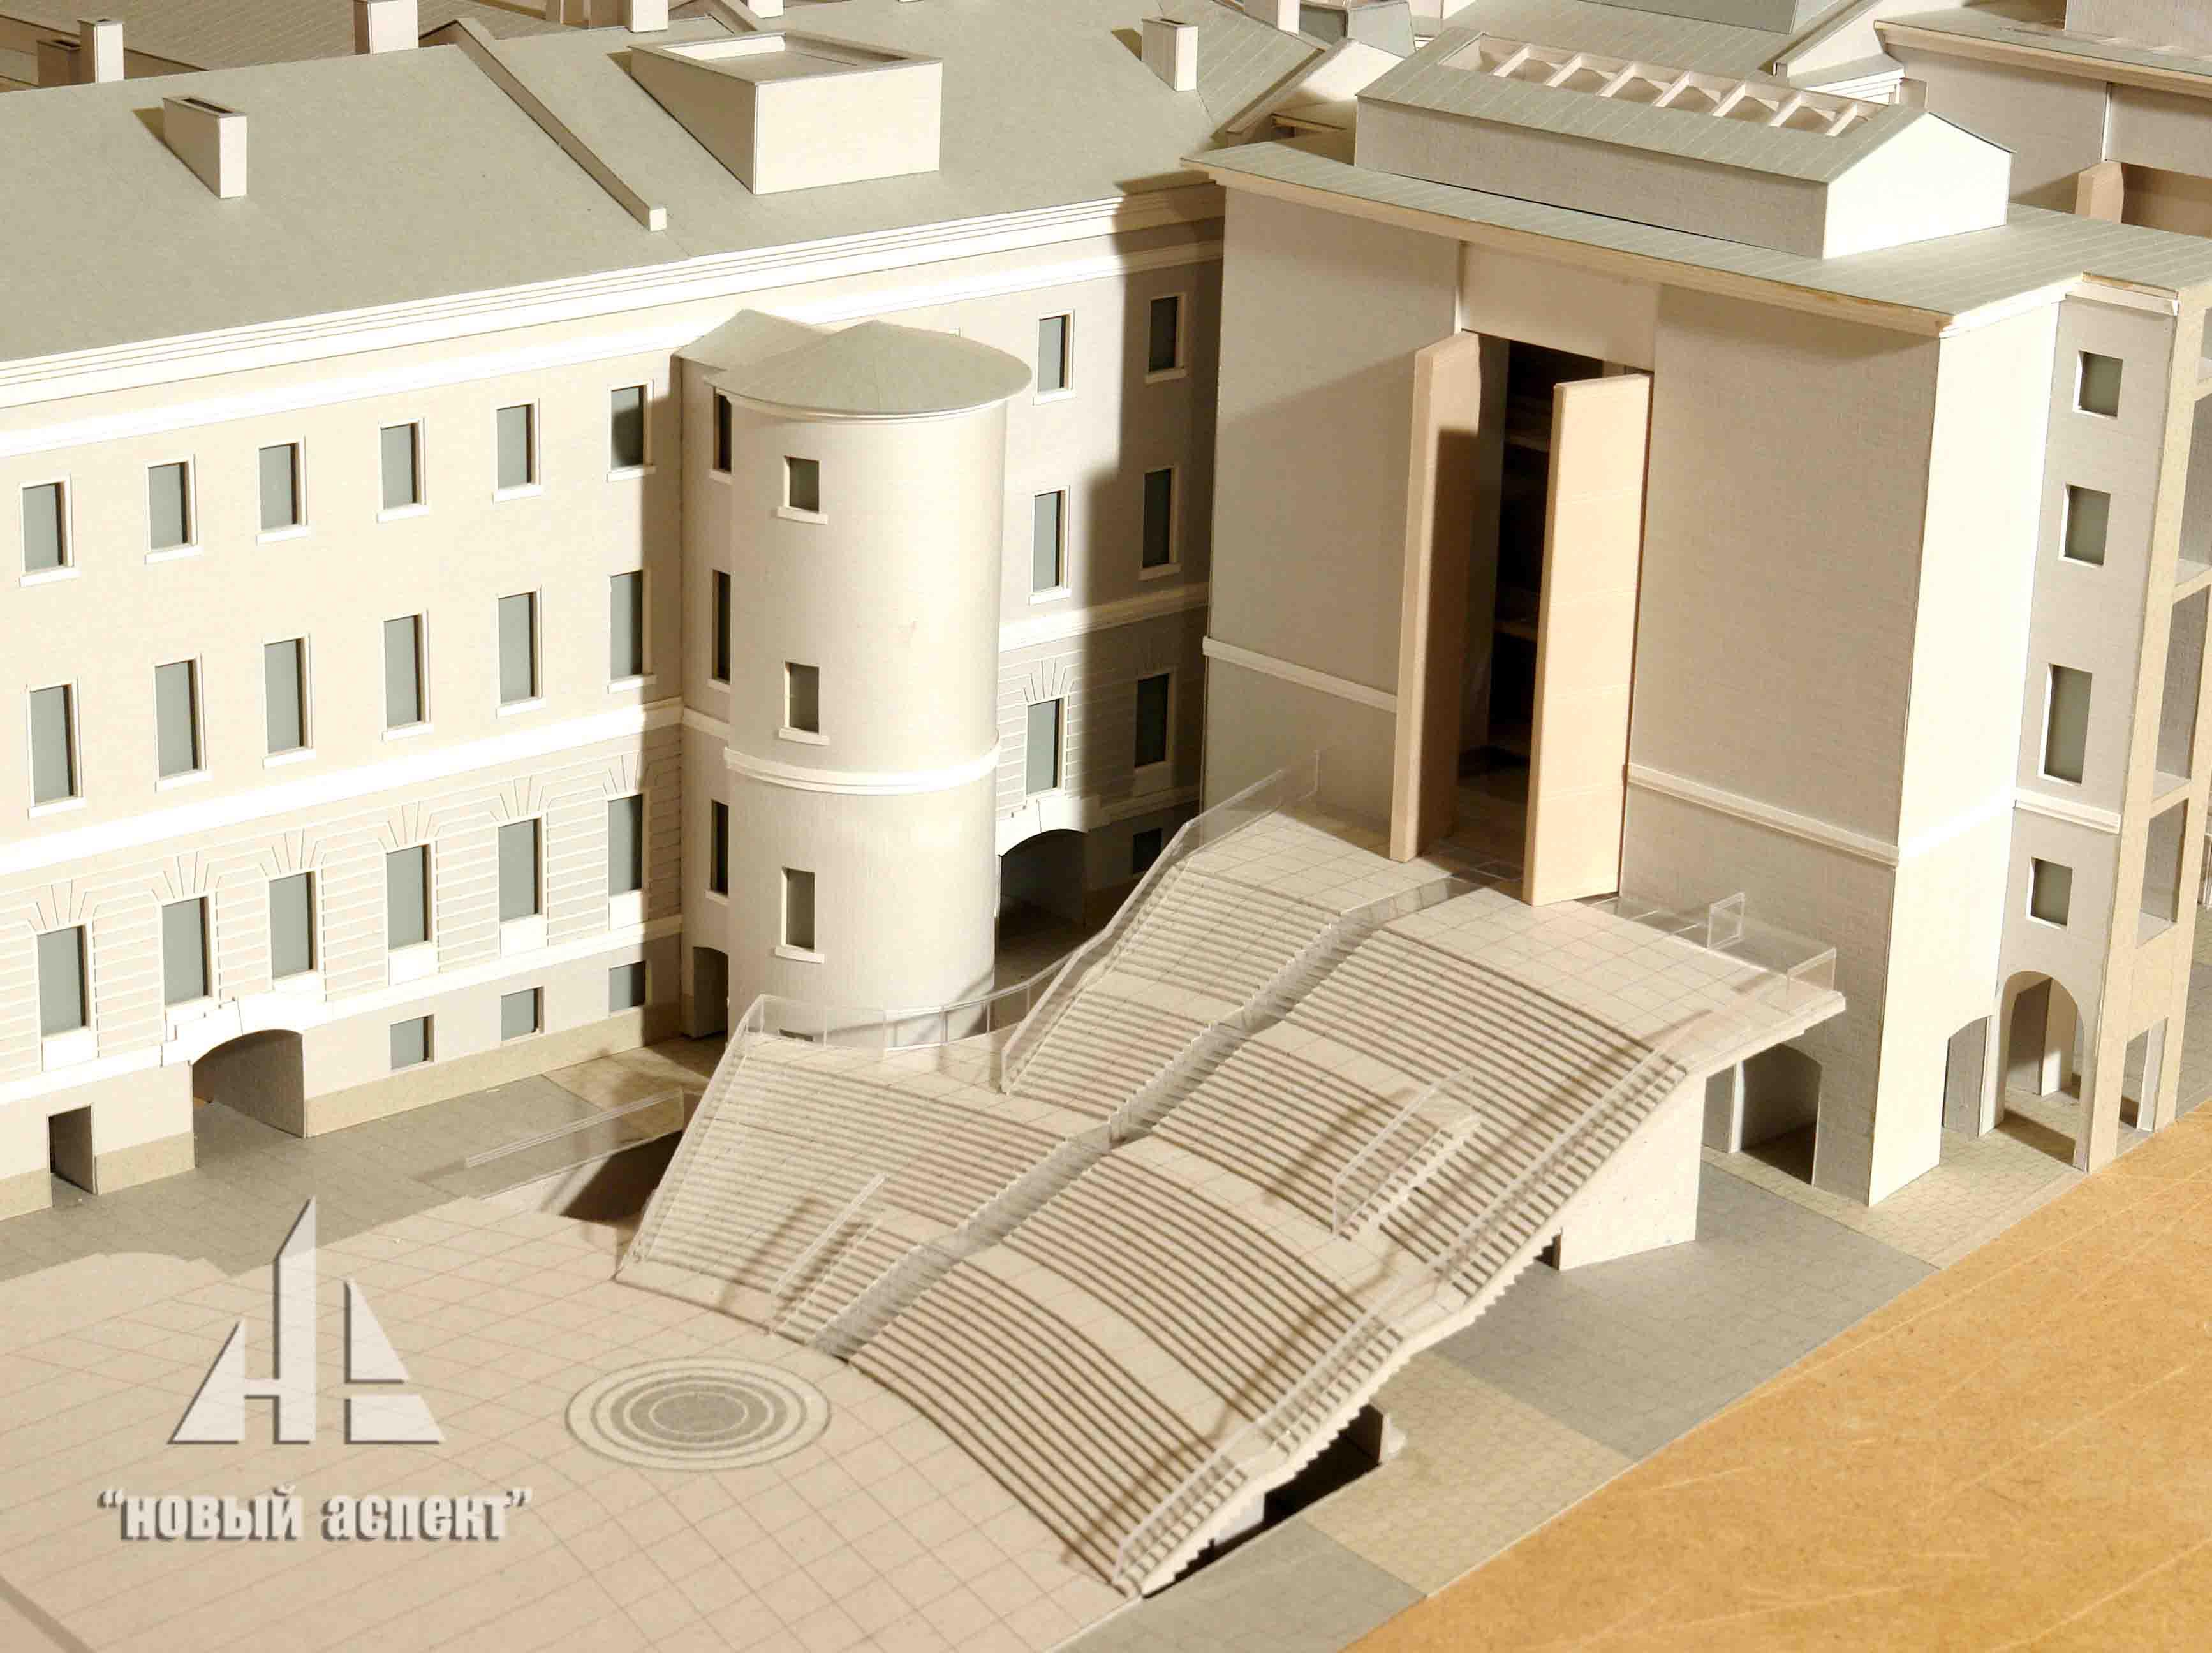 Макеты общественных зданий, ГЛШ (3)